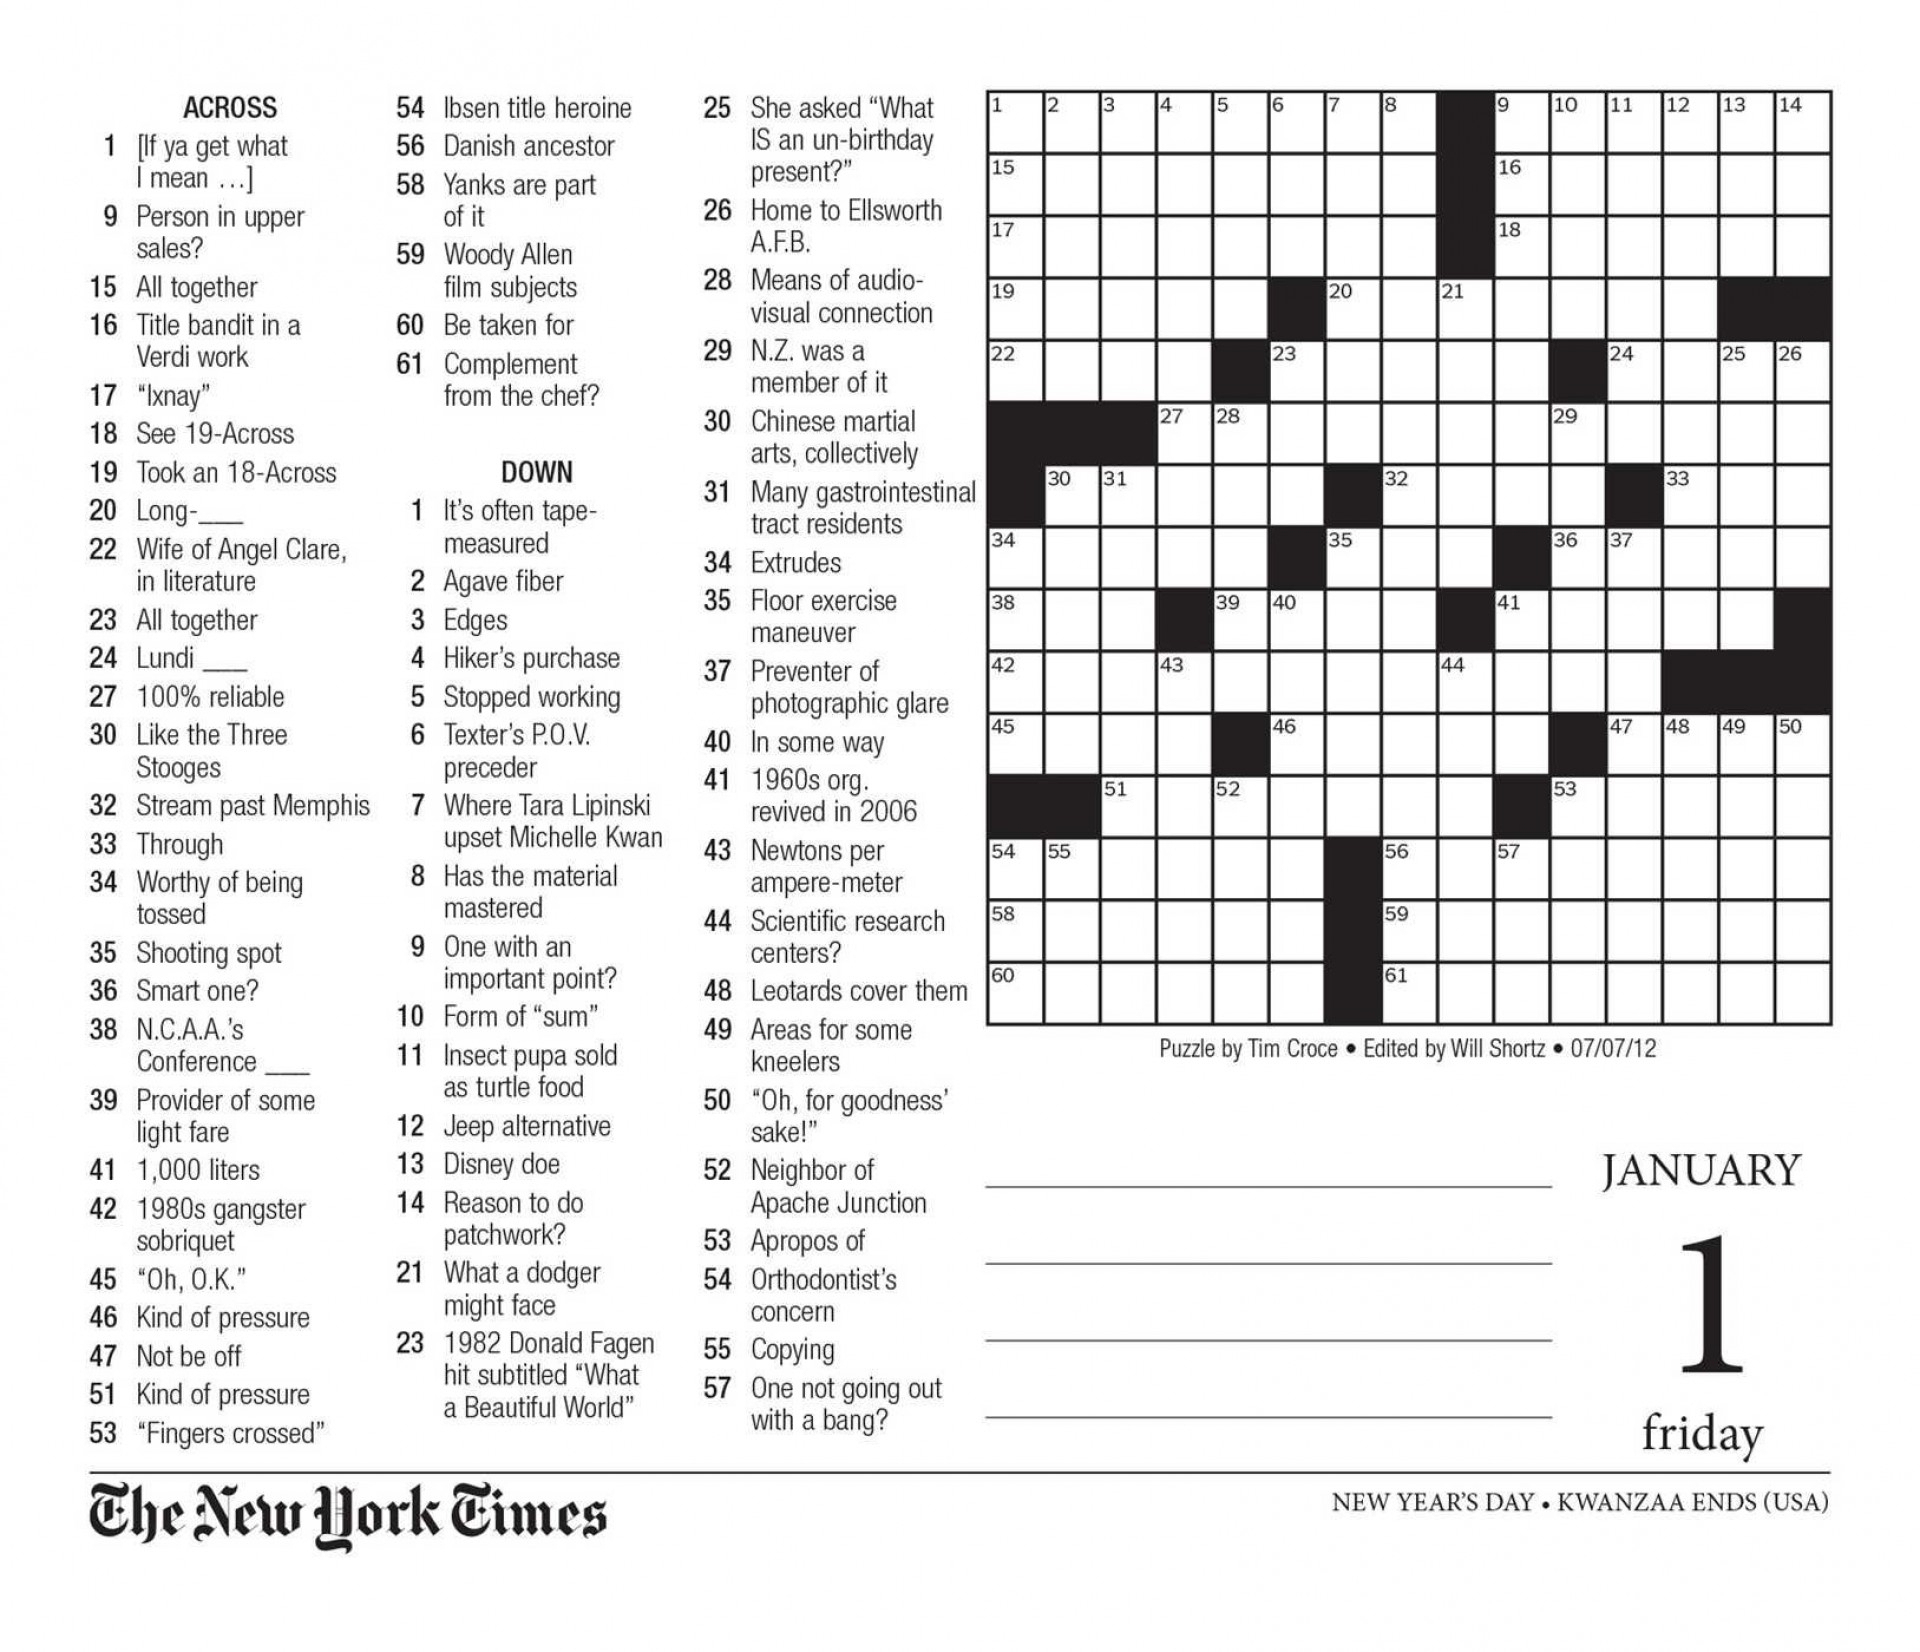 Free Printable Large Print Crossword Puzzles | M3U8 - Easy Printable Crossword Puzzles Large Print